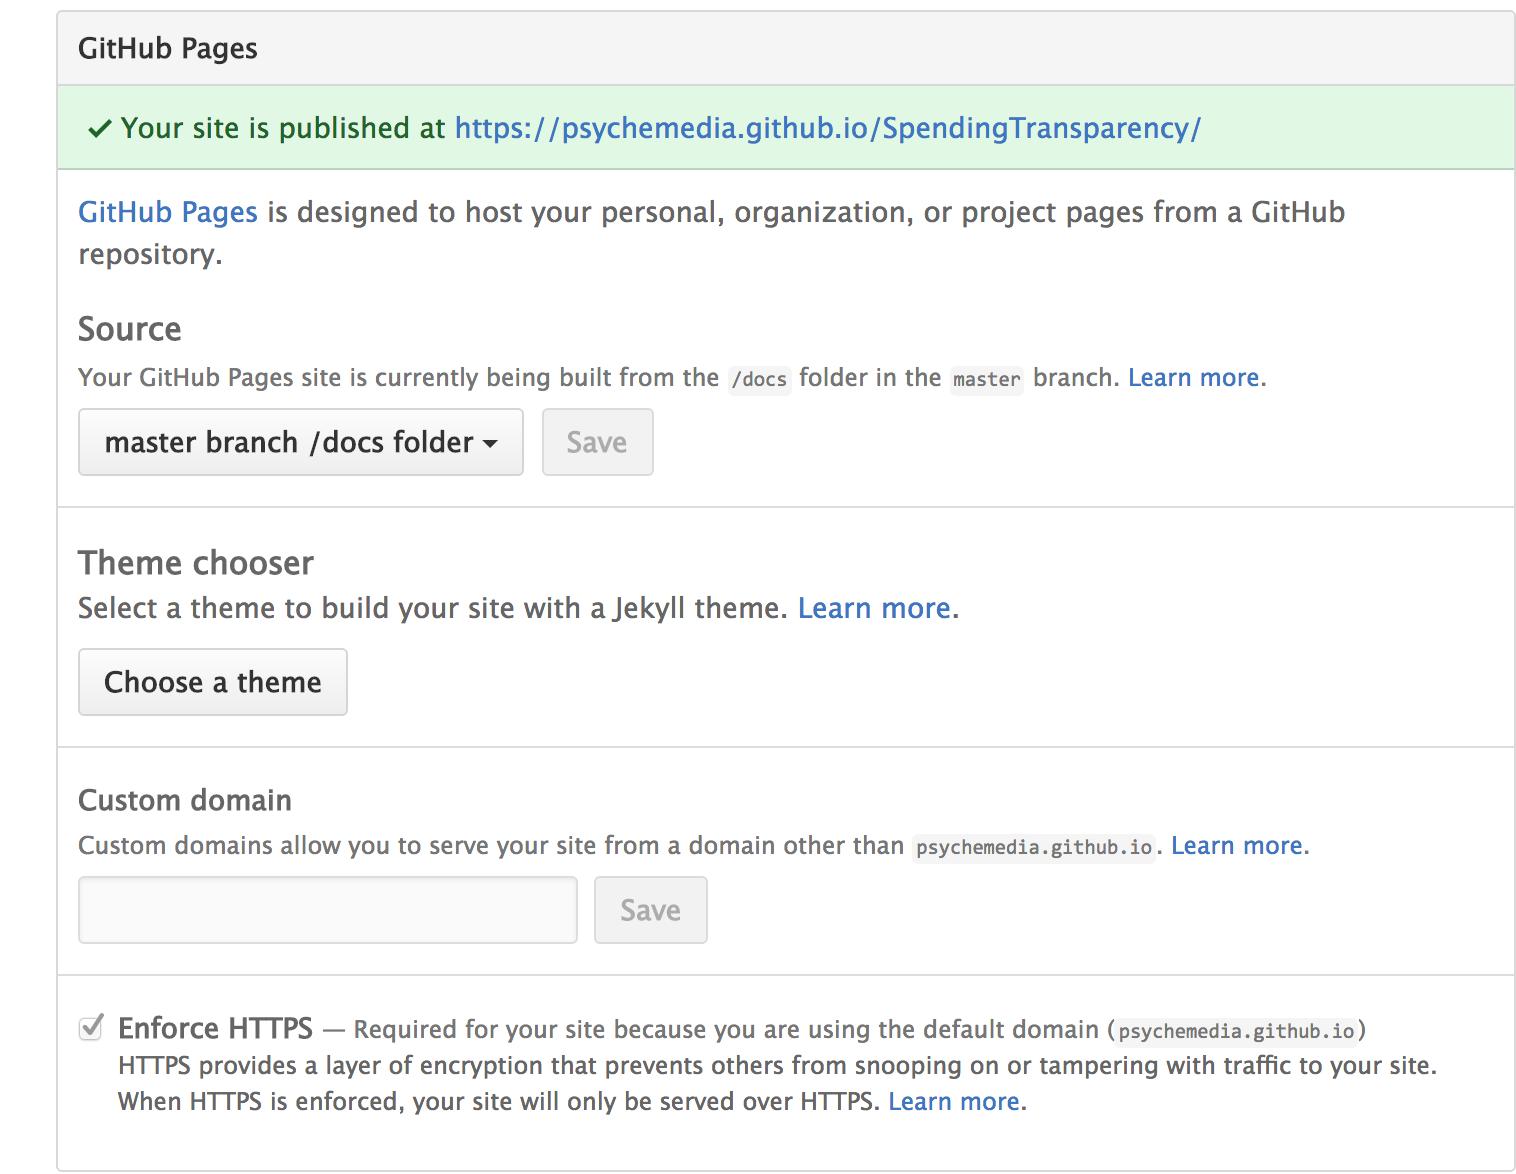 Data Journalism Units on Github – OUseful Info, the blog…